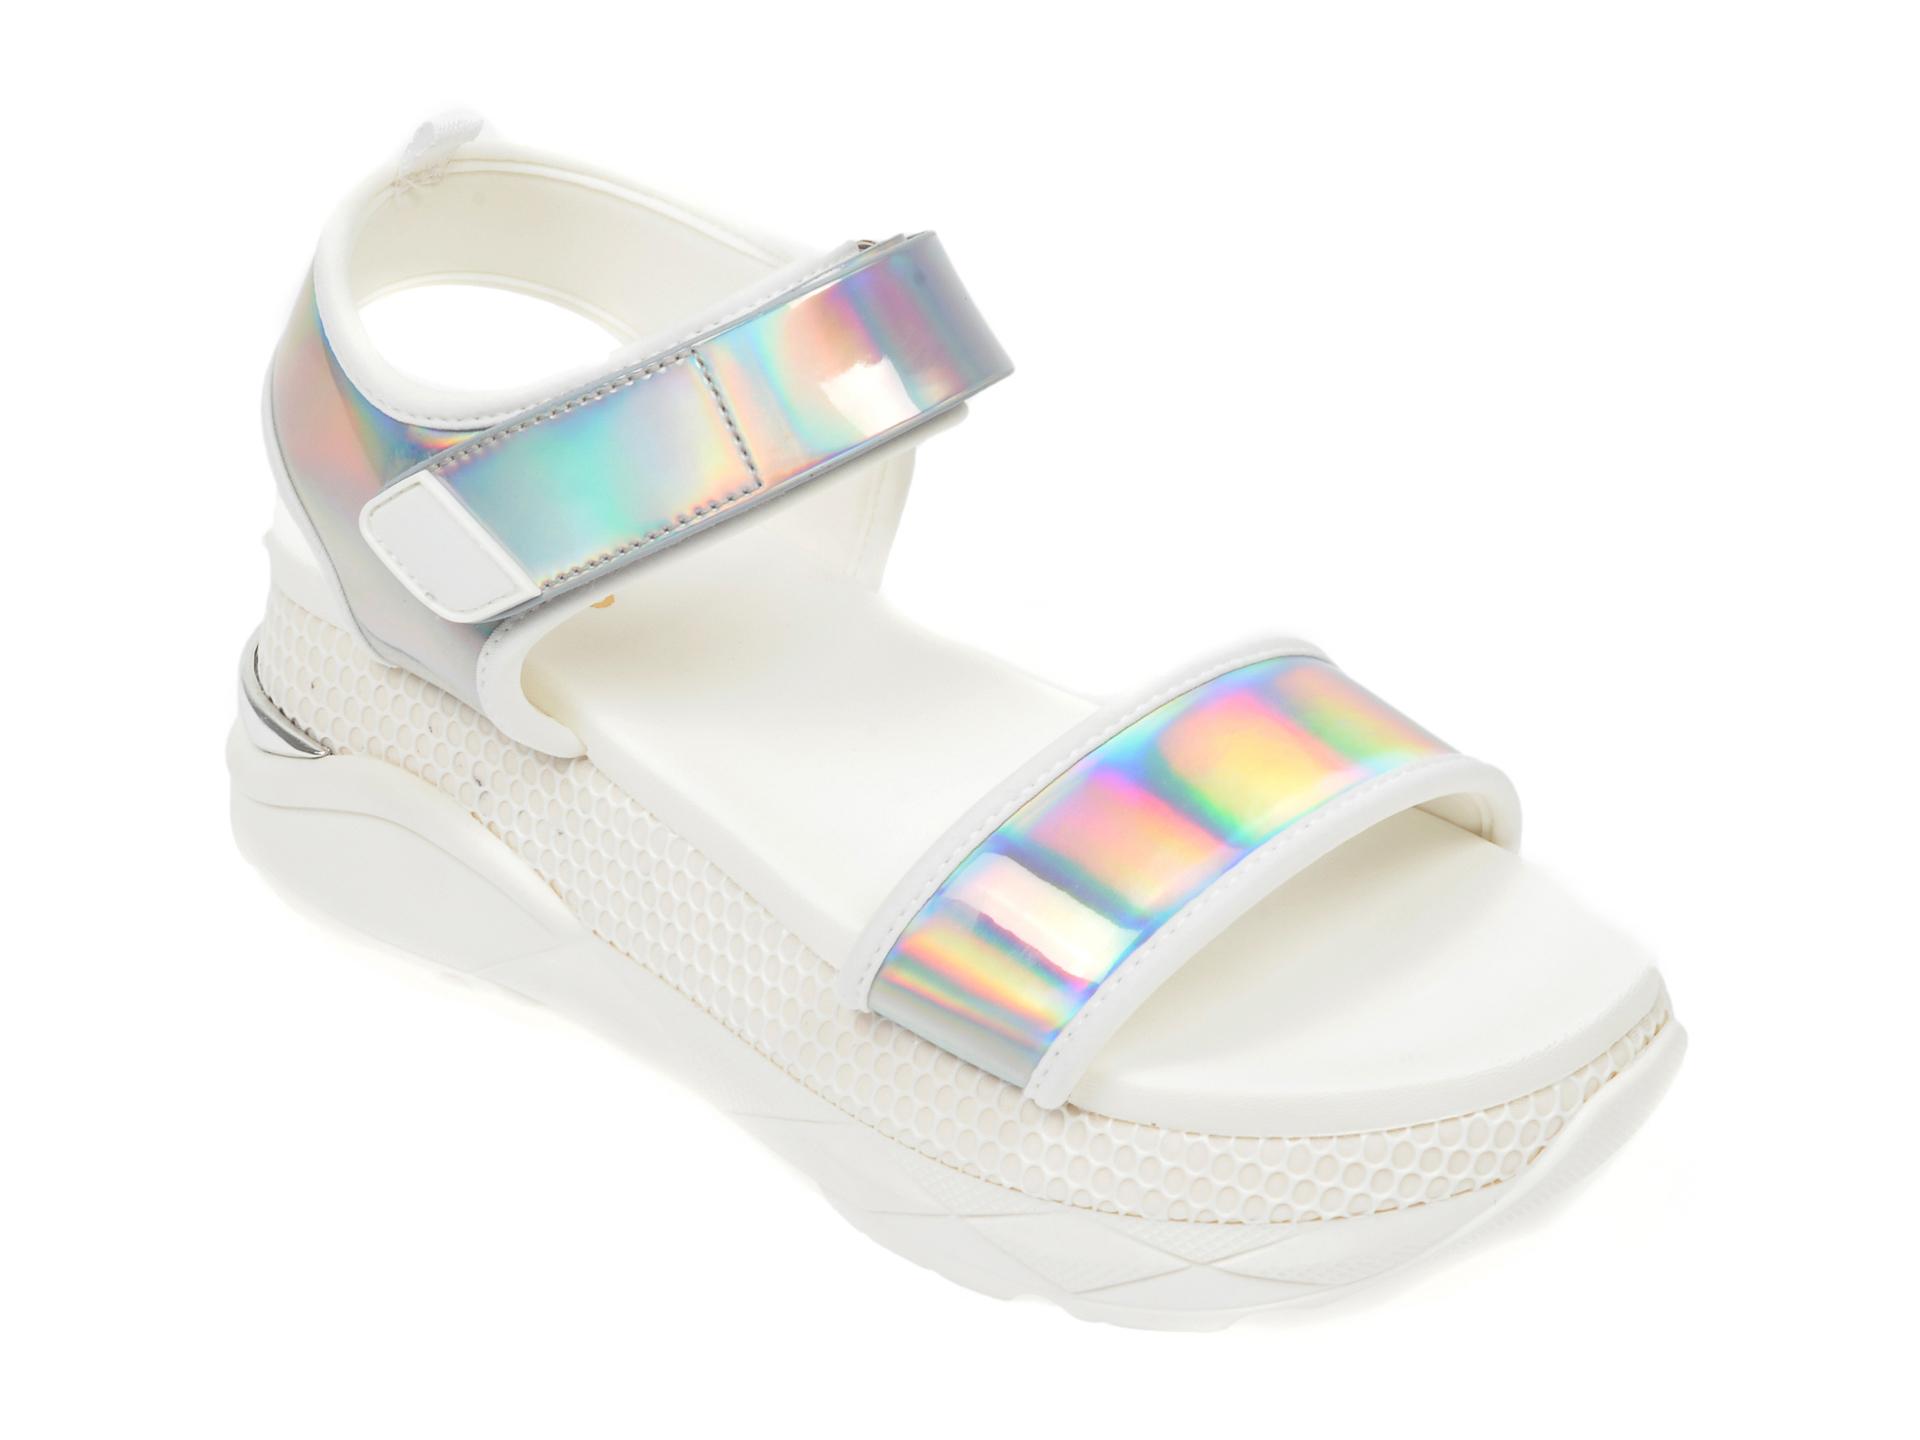 Sandale ALDO albe, Zarella-961, din piele ecologica New